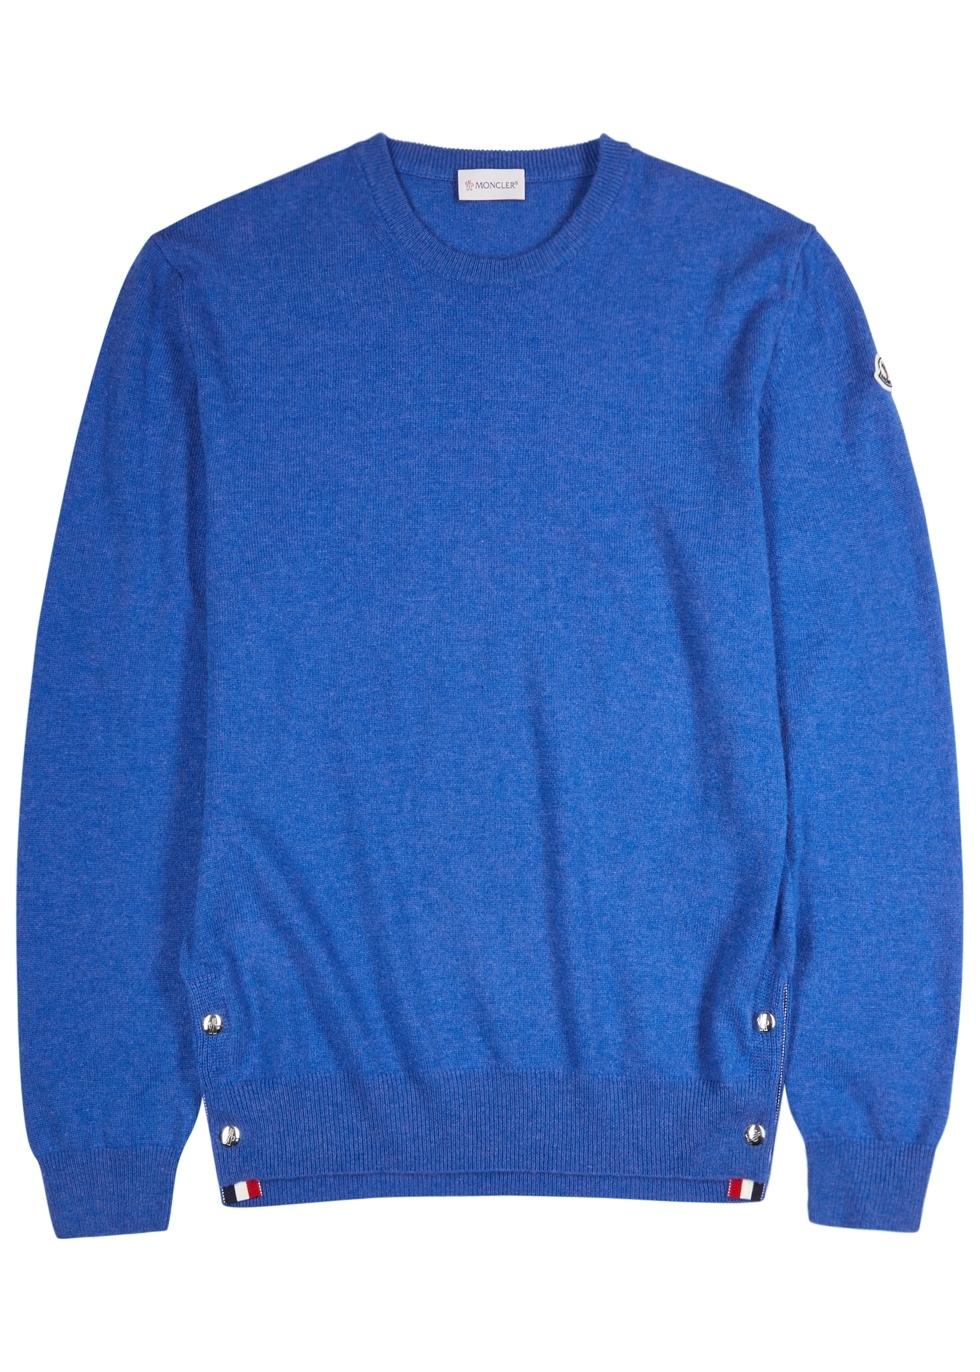 b07c1c0308cfc Men s Designer Knitwear and Jumpers - Harvey Nichols